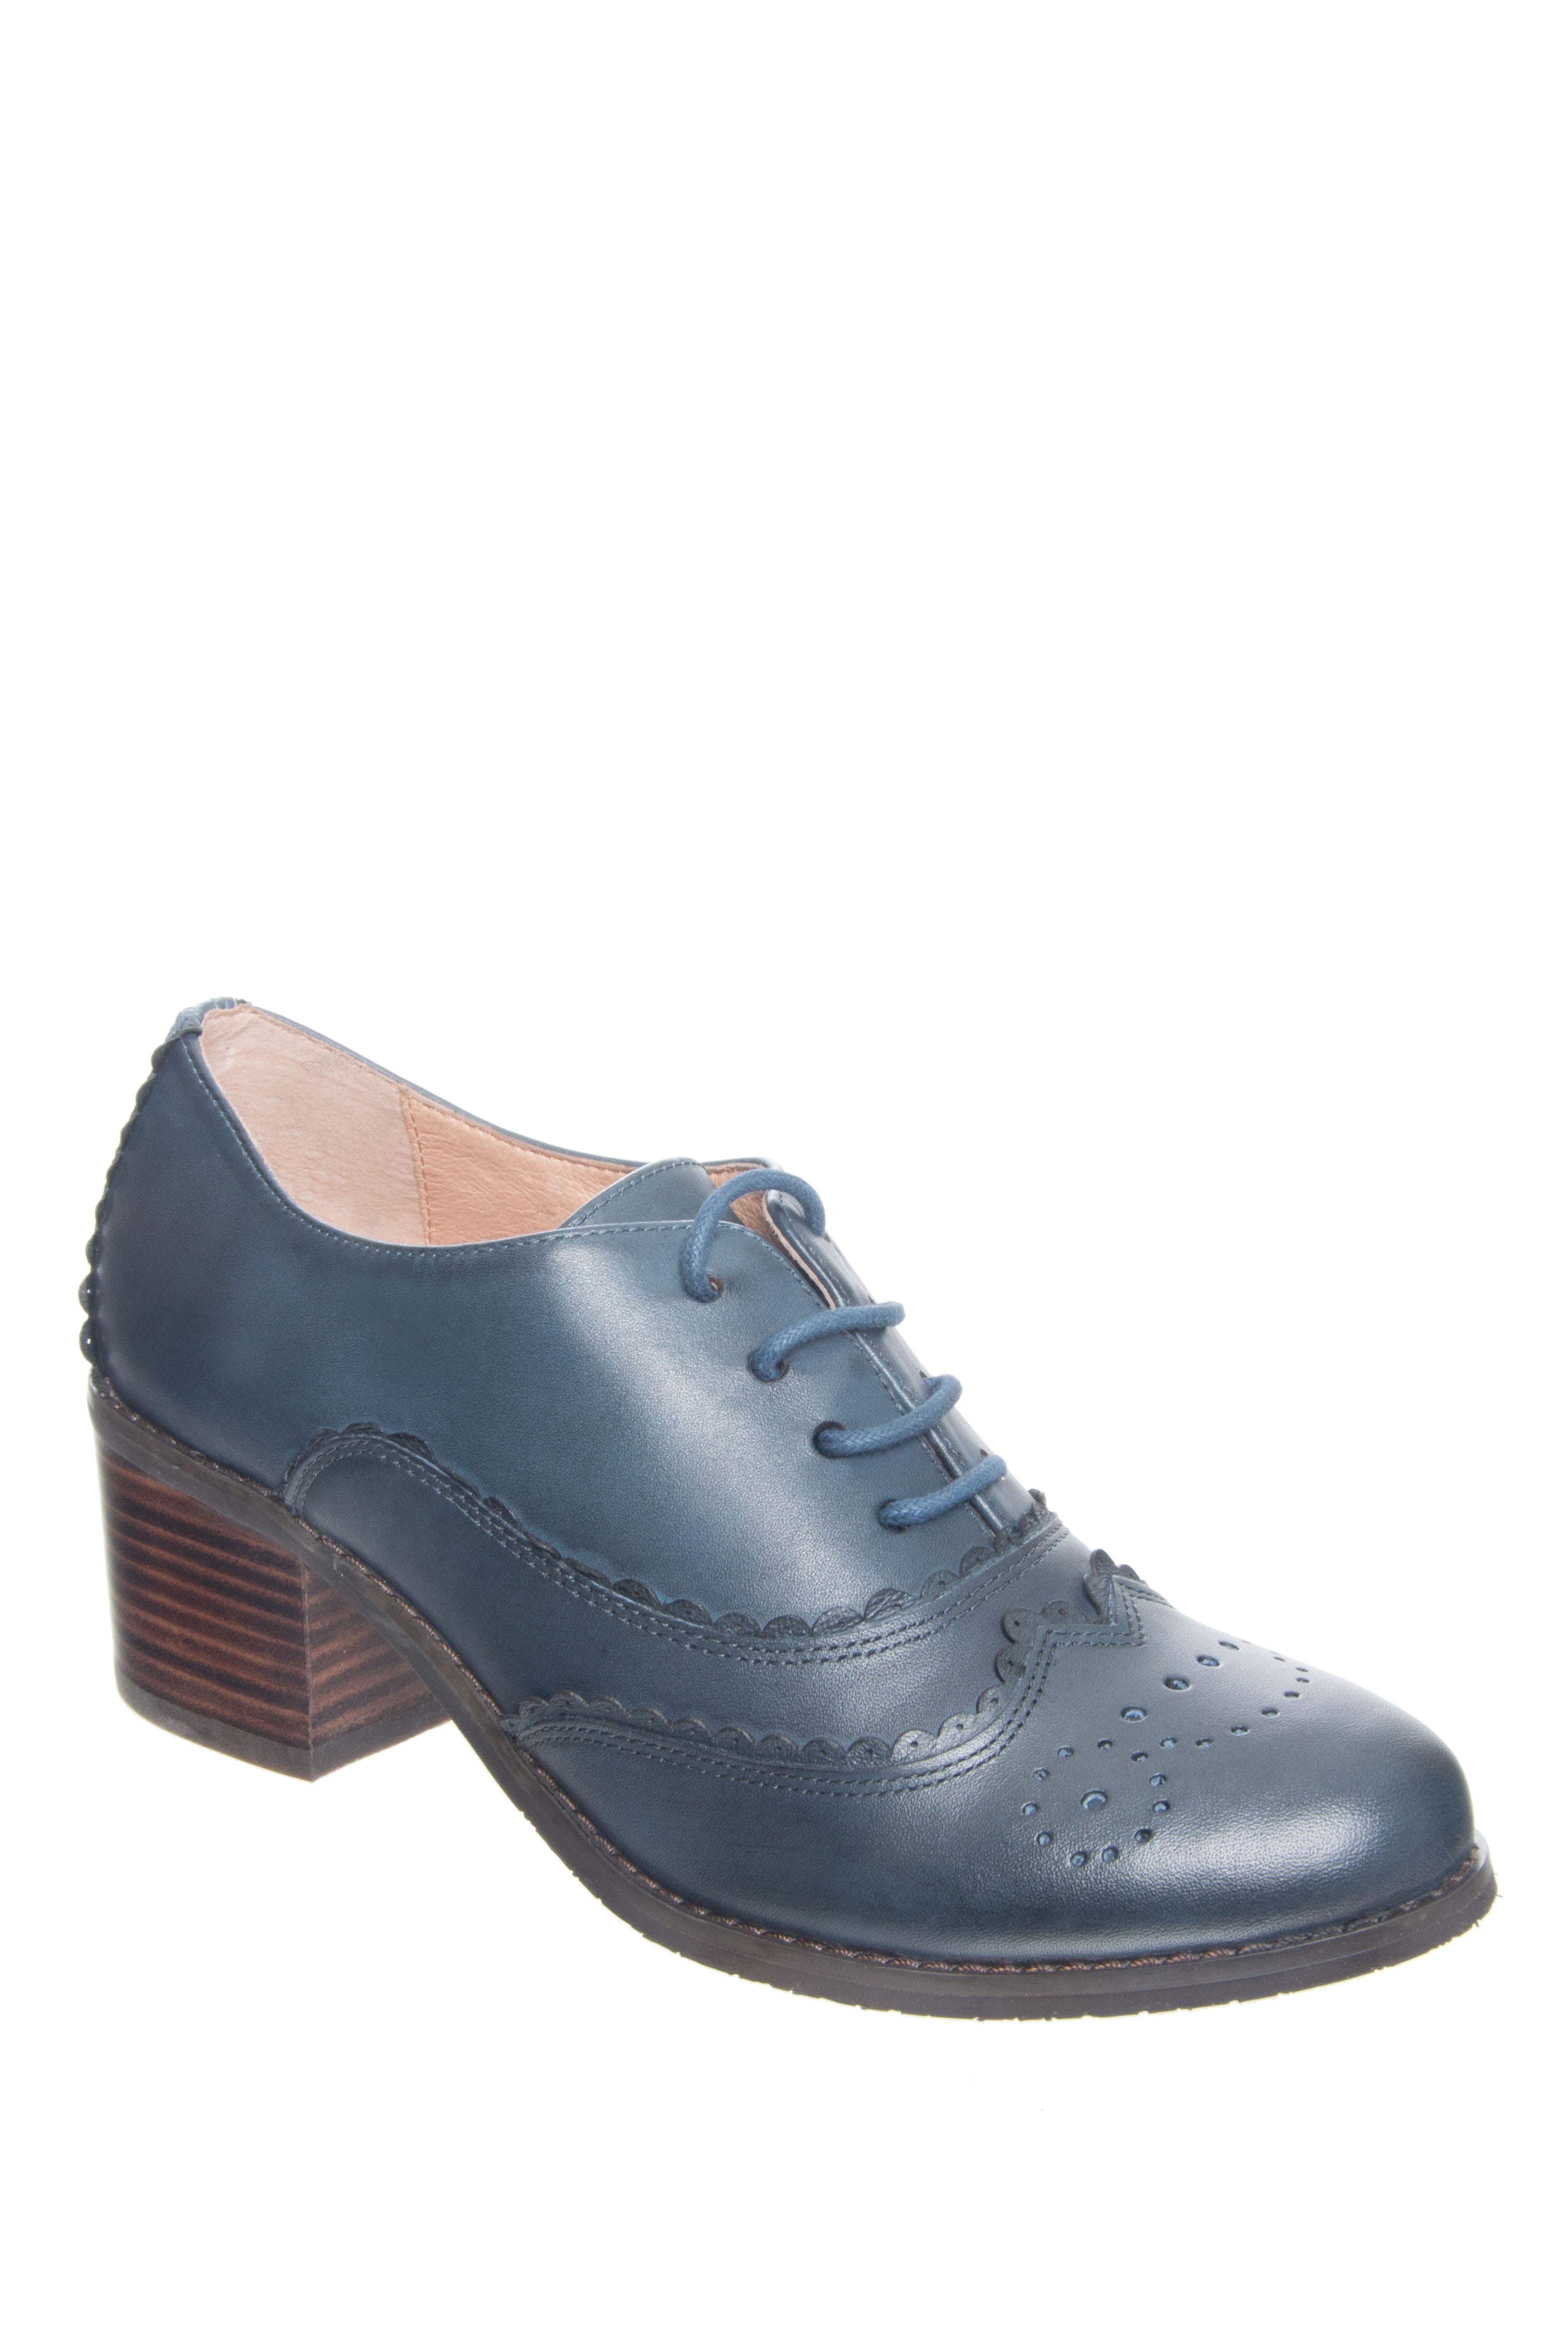 Miz Mooz Chiara Mid Heel Oxford - Blue